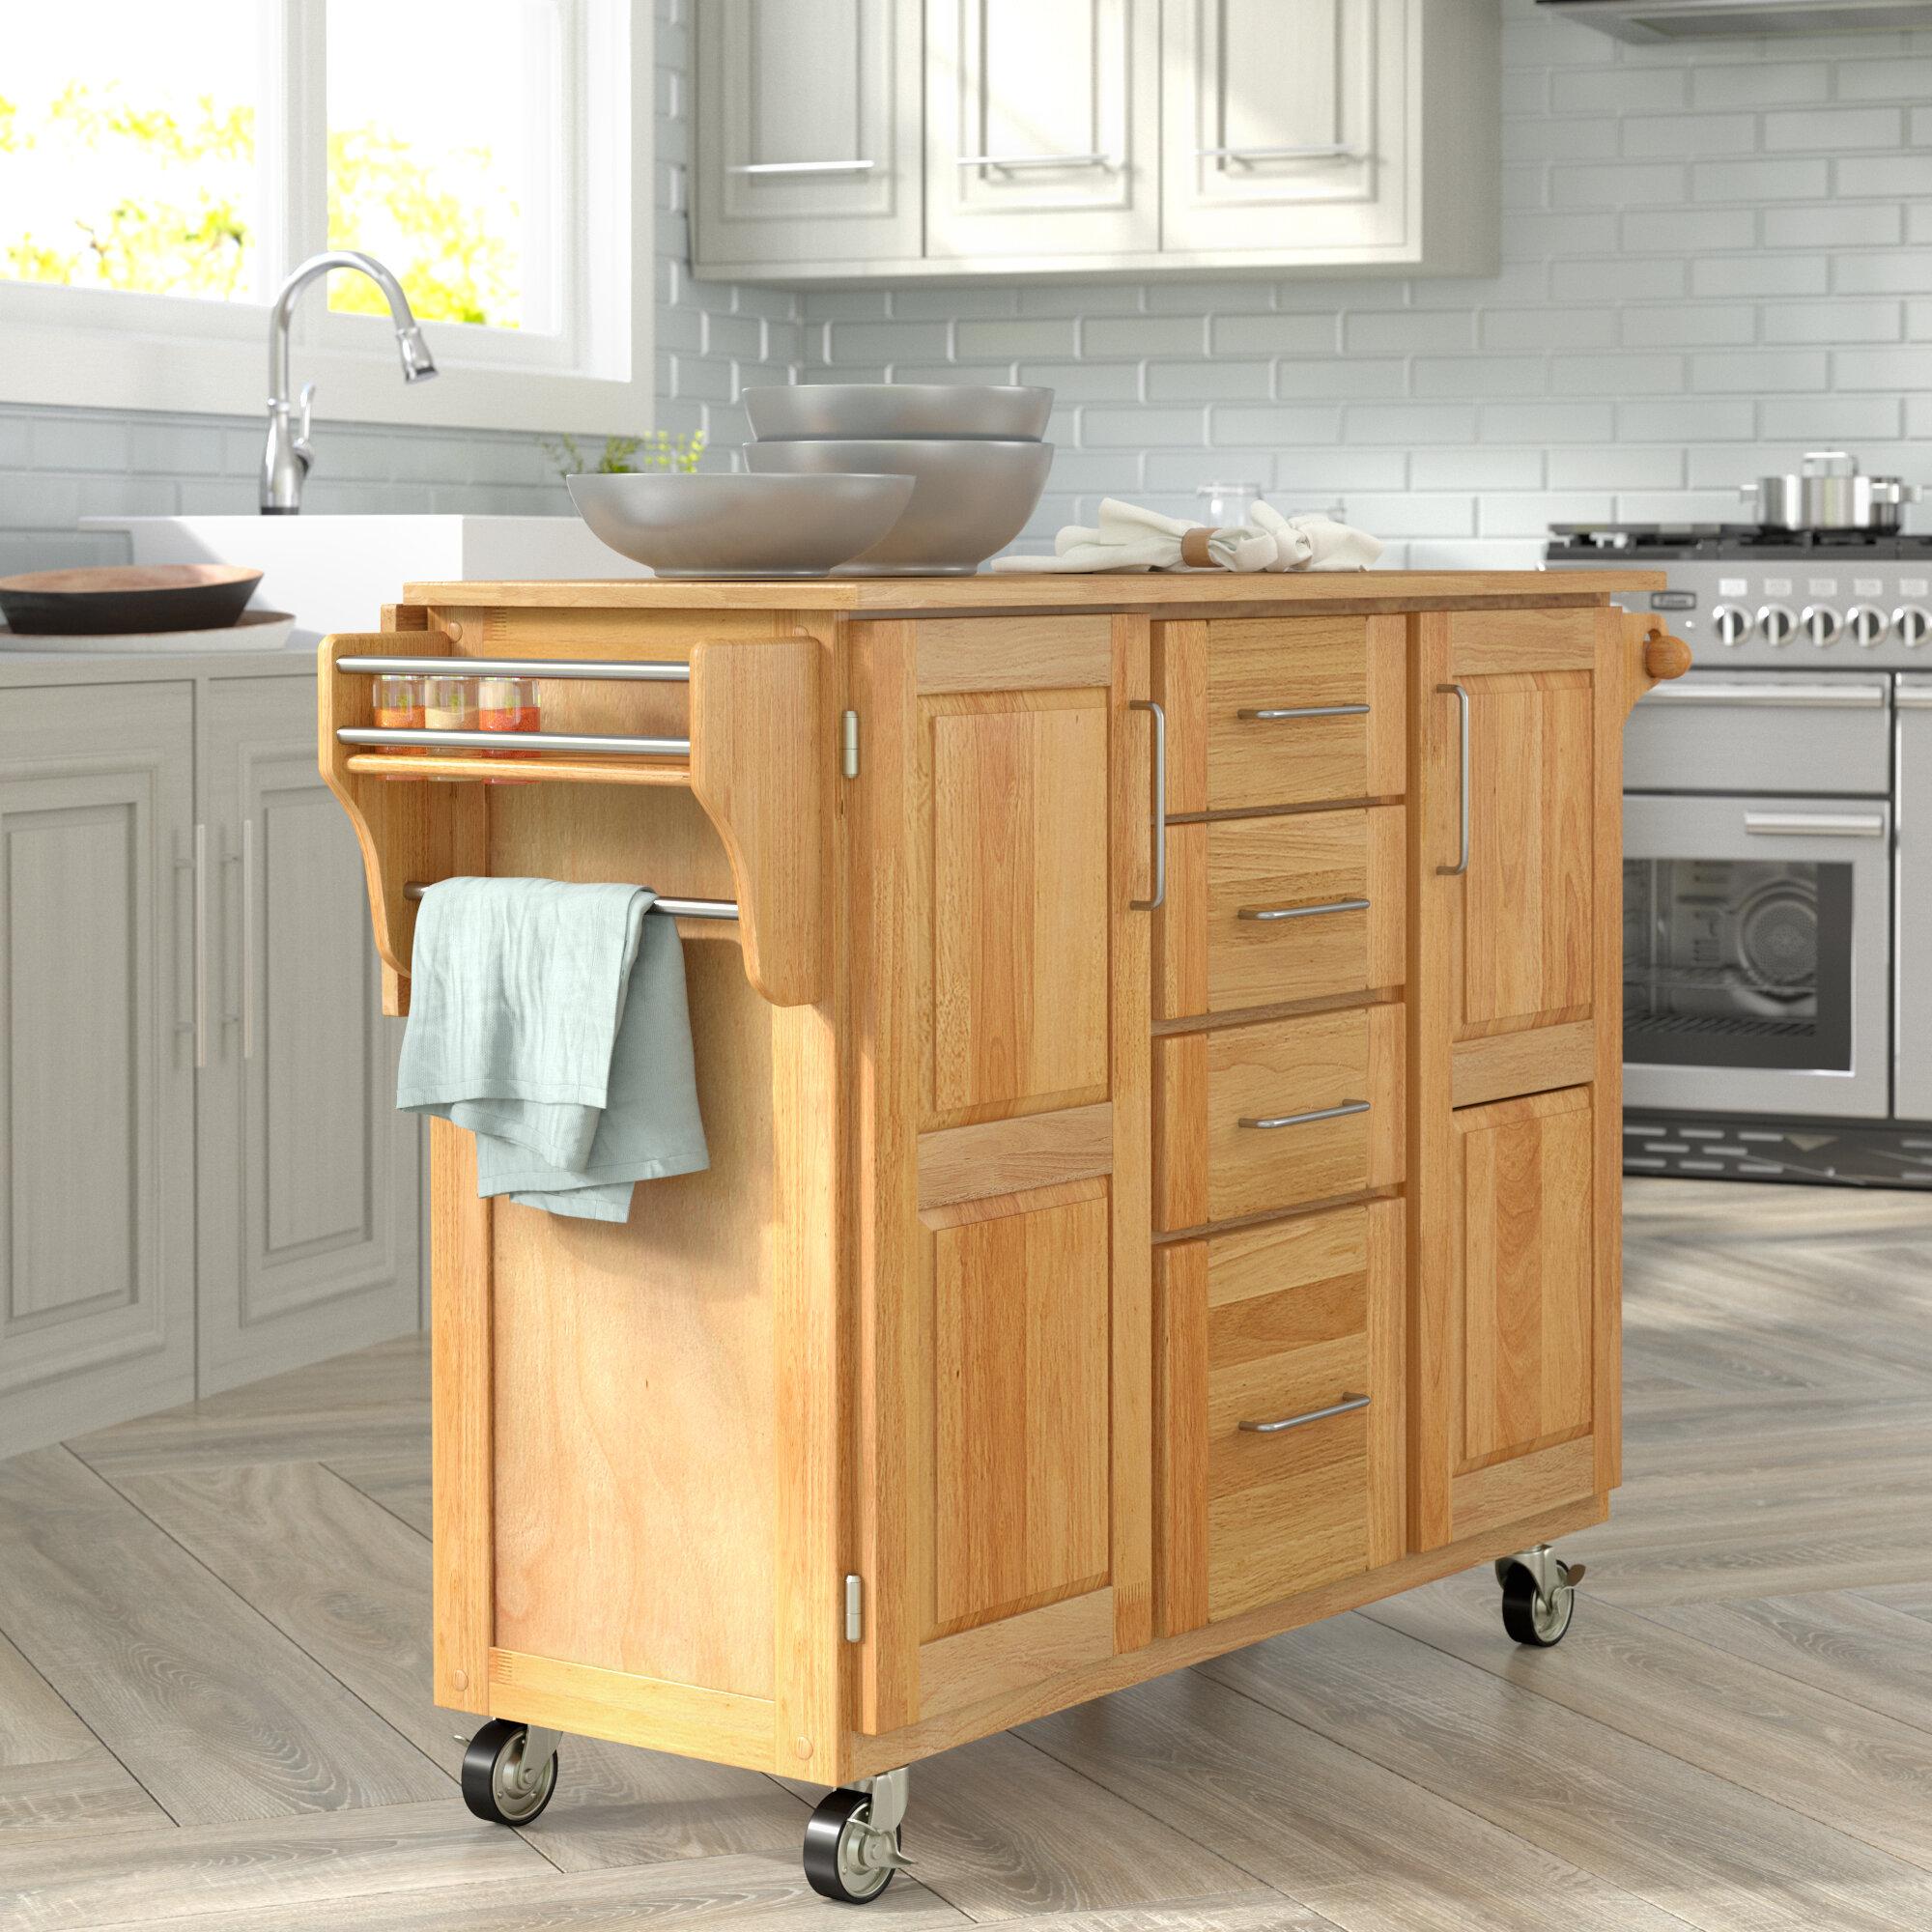 Butcher Block Kitchen Islands Carts You Ll Love In 2020 Wayfair